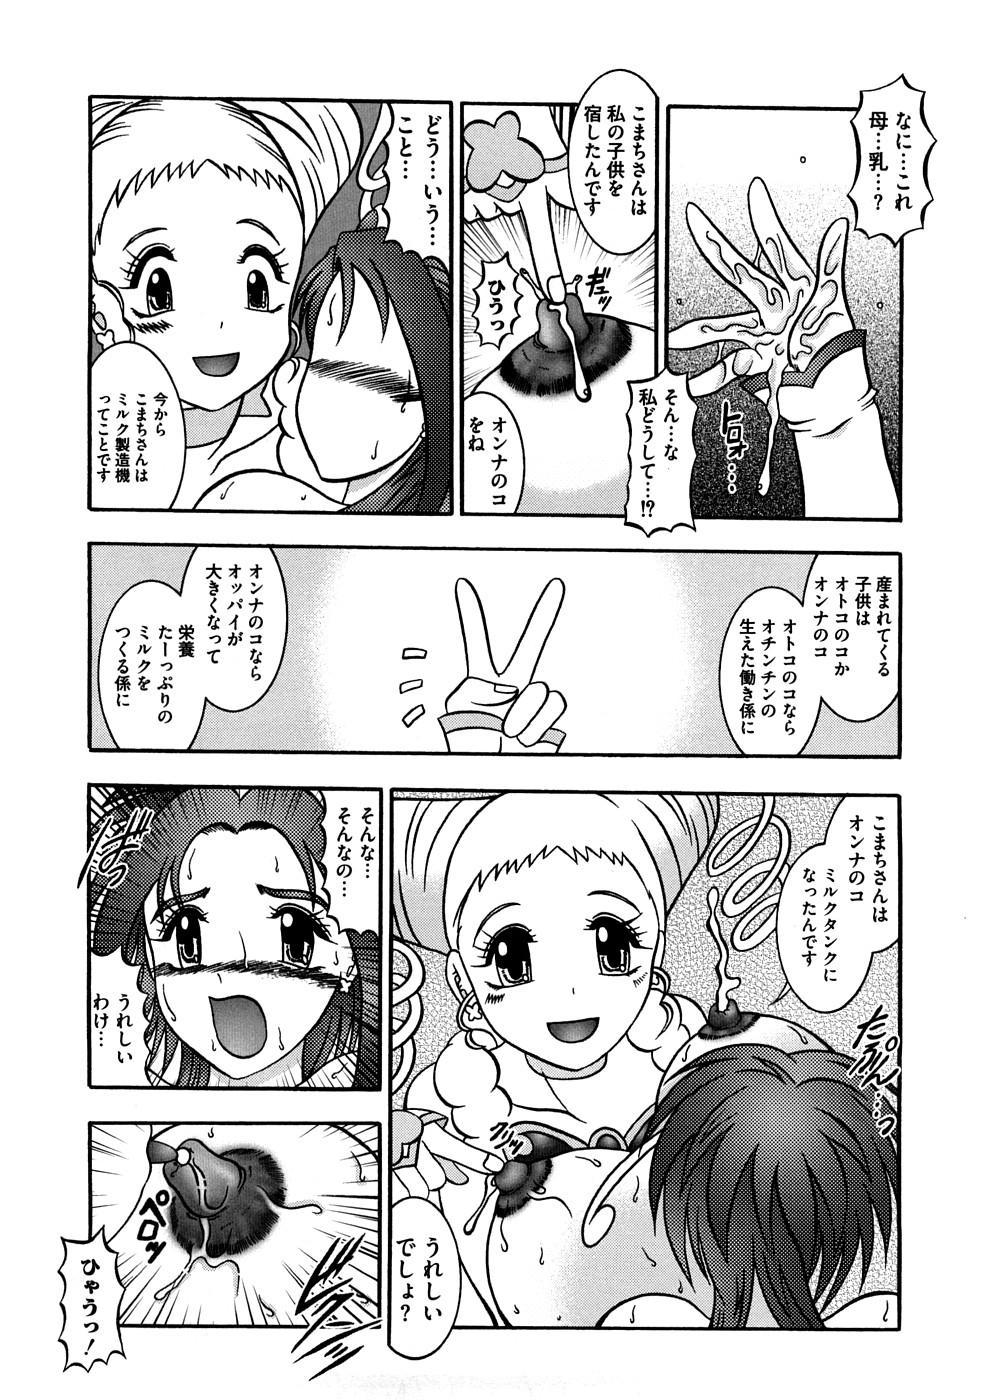 Cure Cure Ryoujoku Emaki Pre●ure EroParoAnthology 106